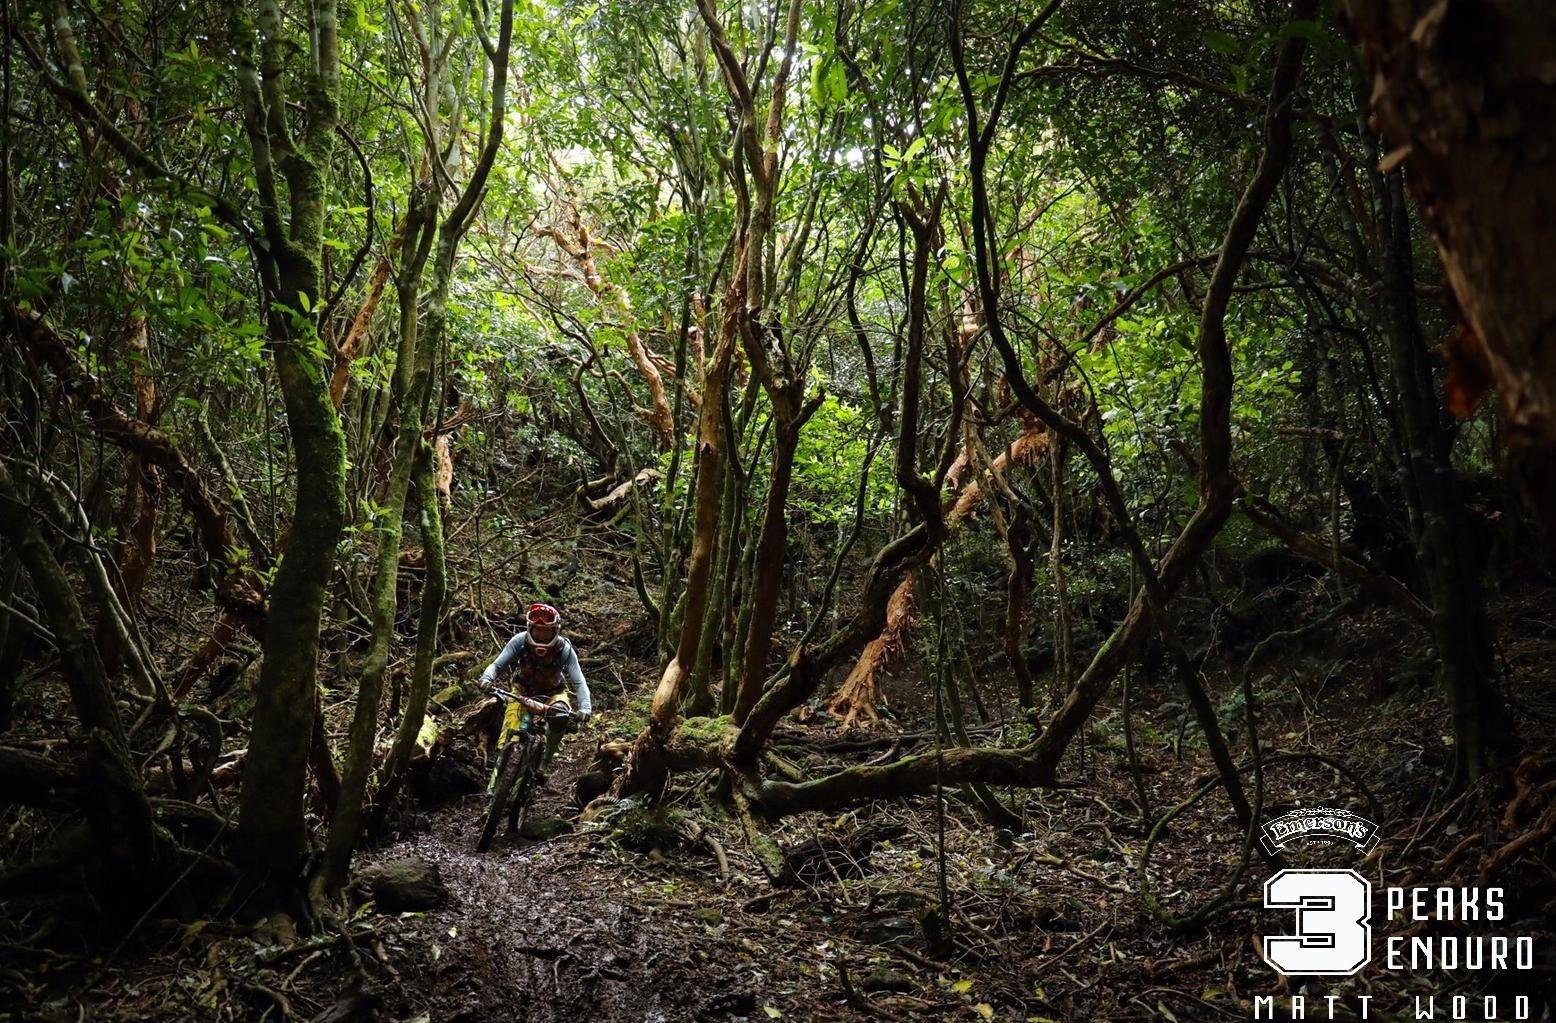 Mel Bloomfield Deep in the Dunedin green. Photo by Matt Wood.